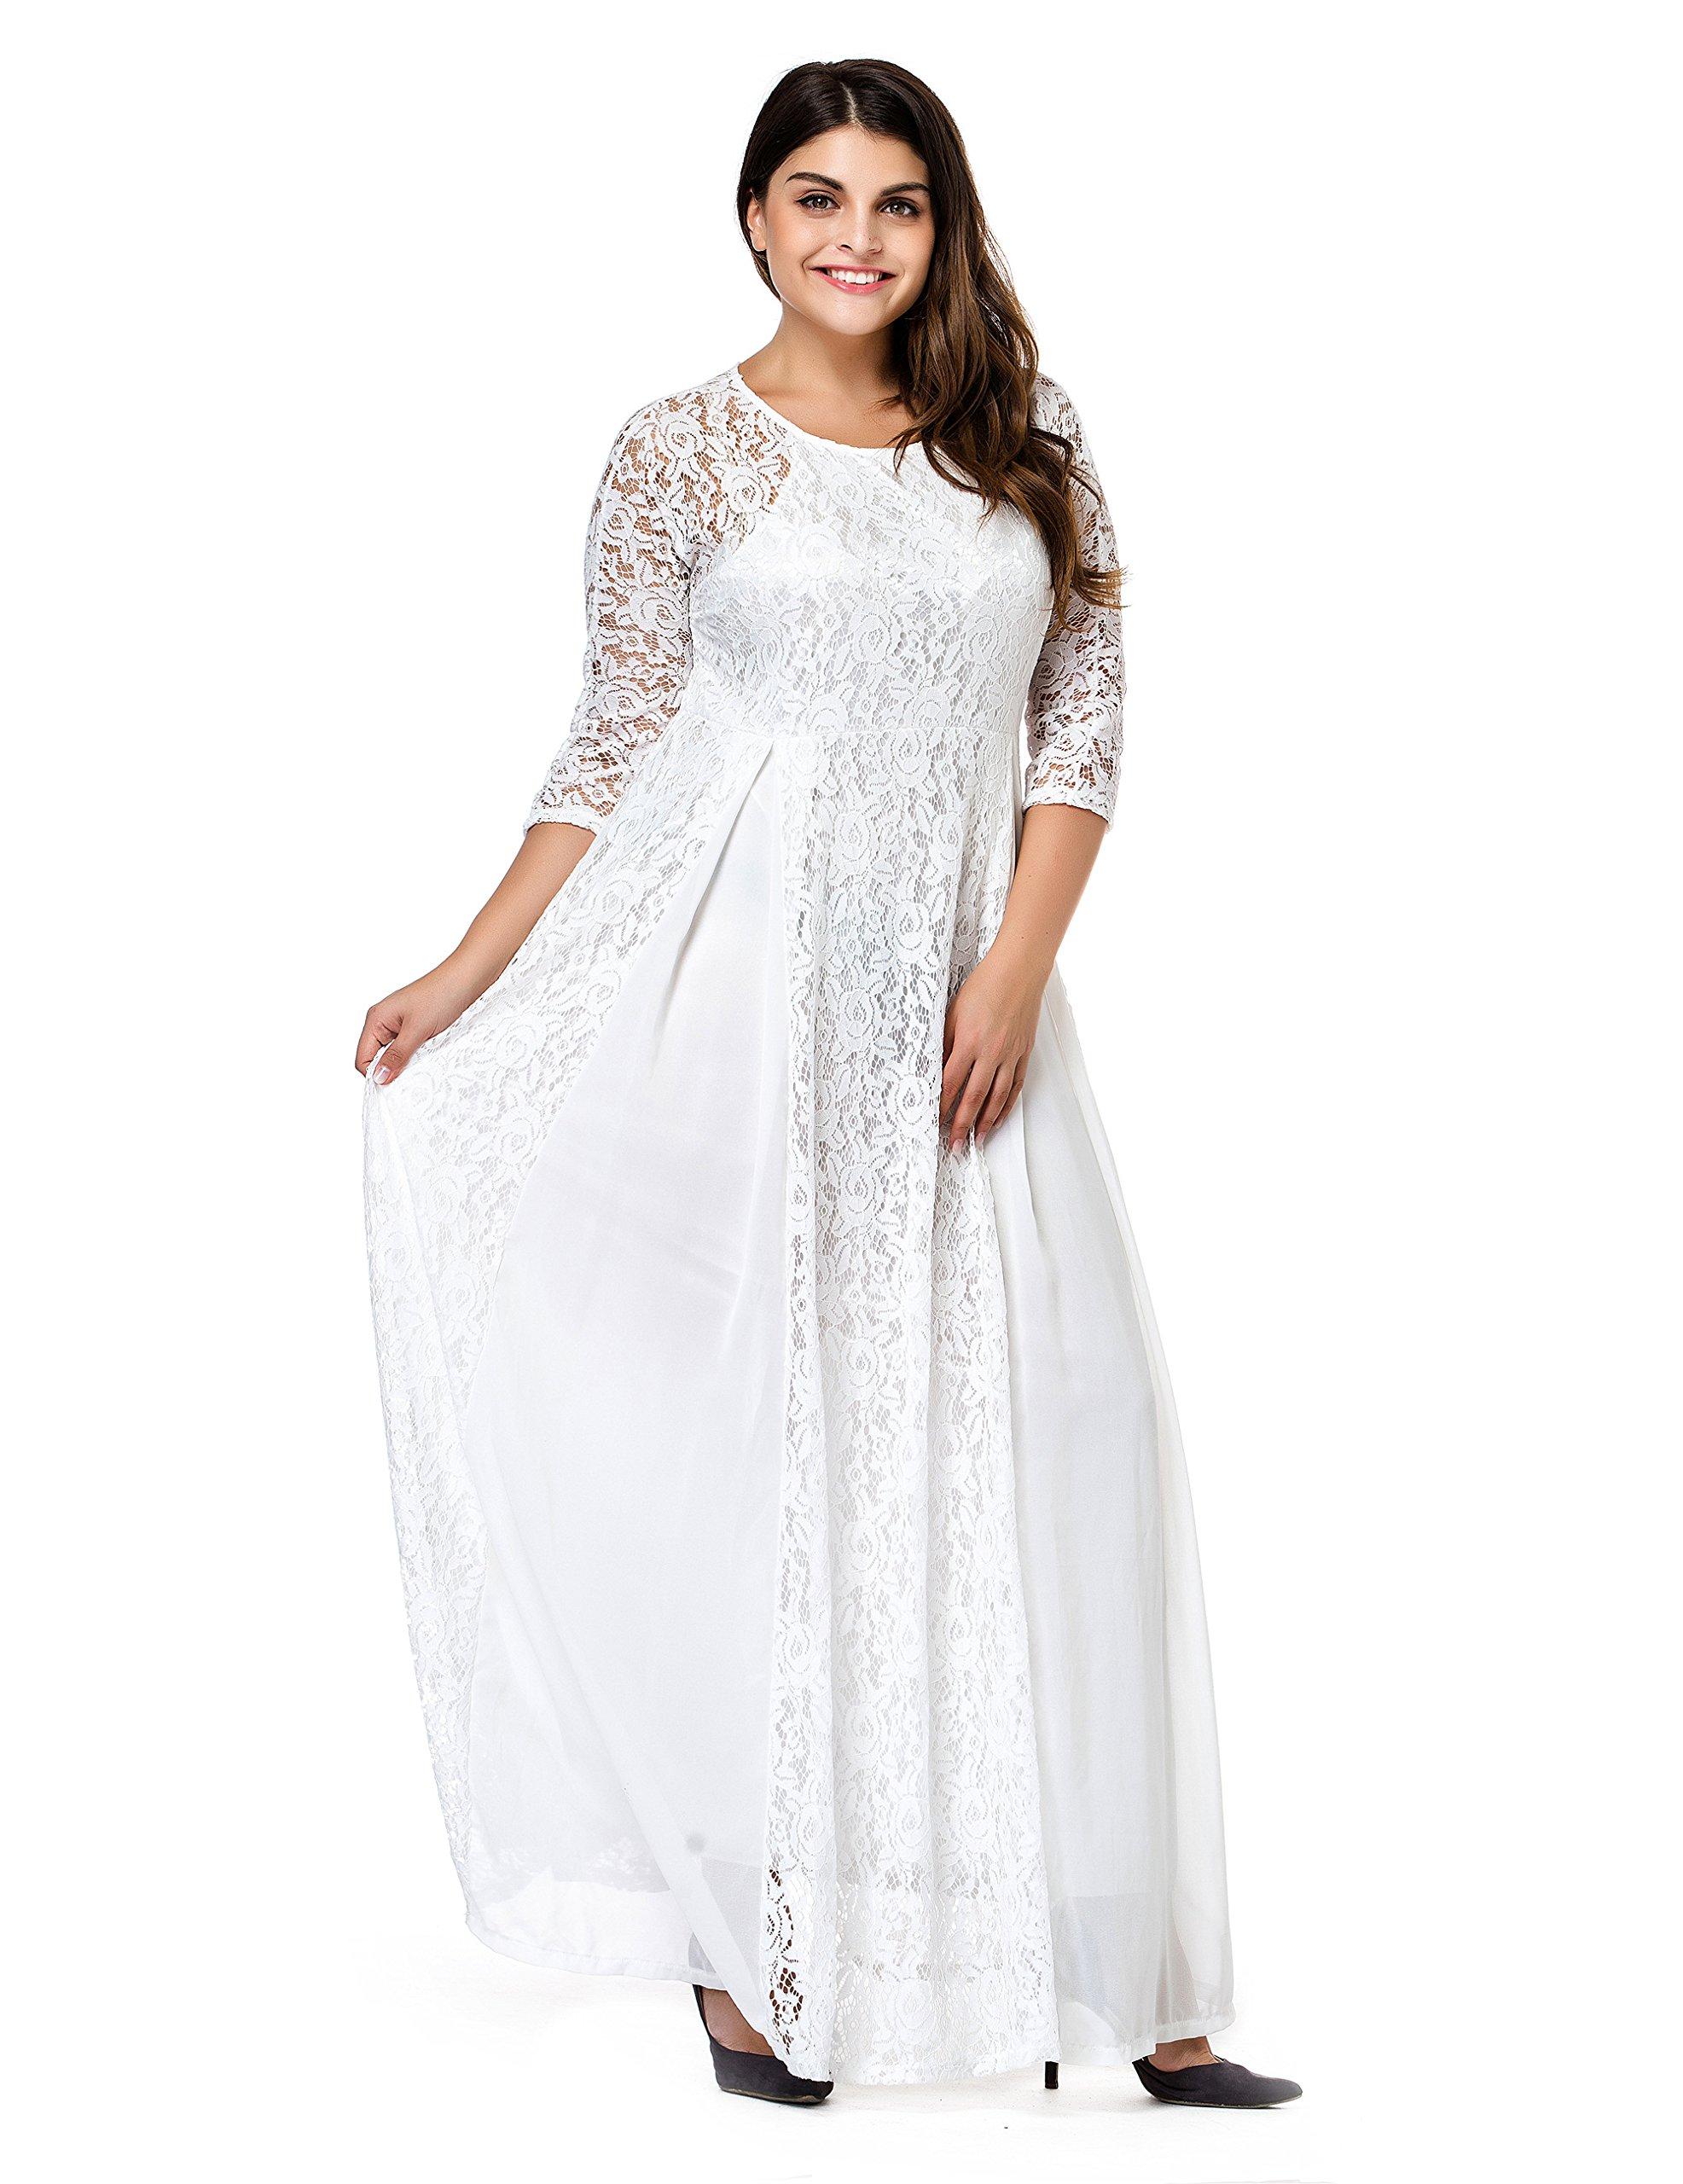 ESPRLIA Women's Plus Size Lace 3/4 Sleeve Evening Party Formal Wedding Maxi Dress (4X, White)